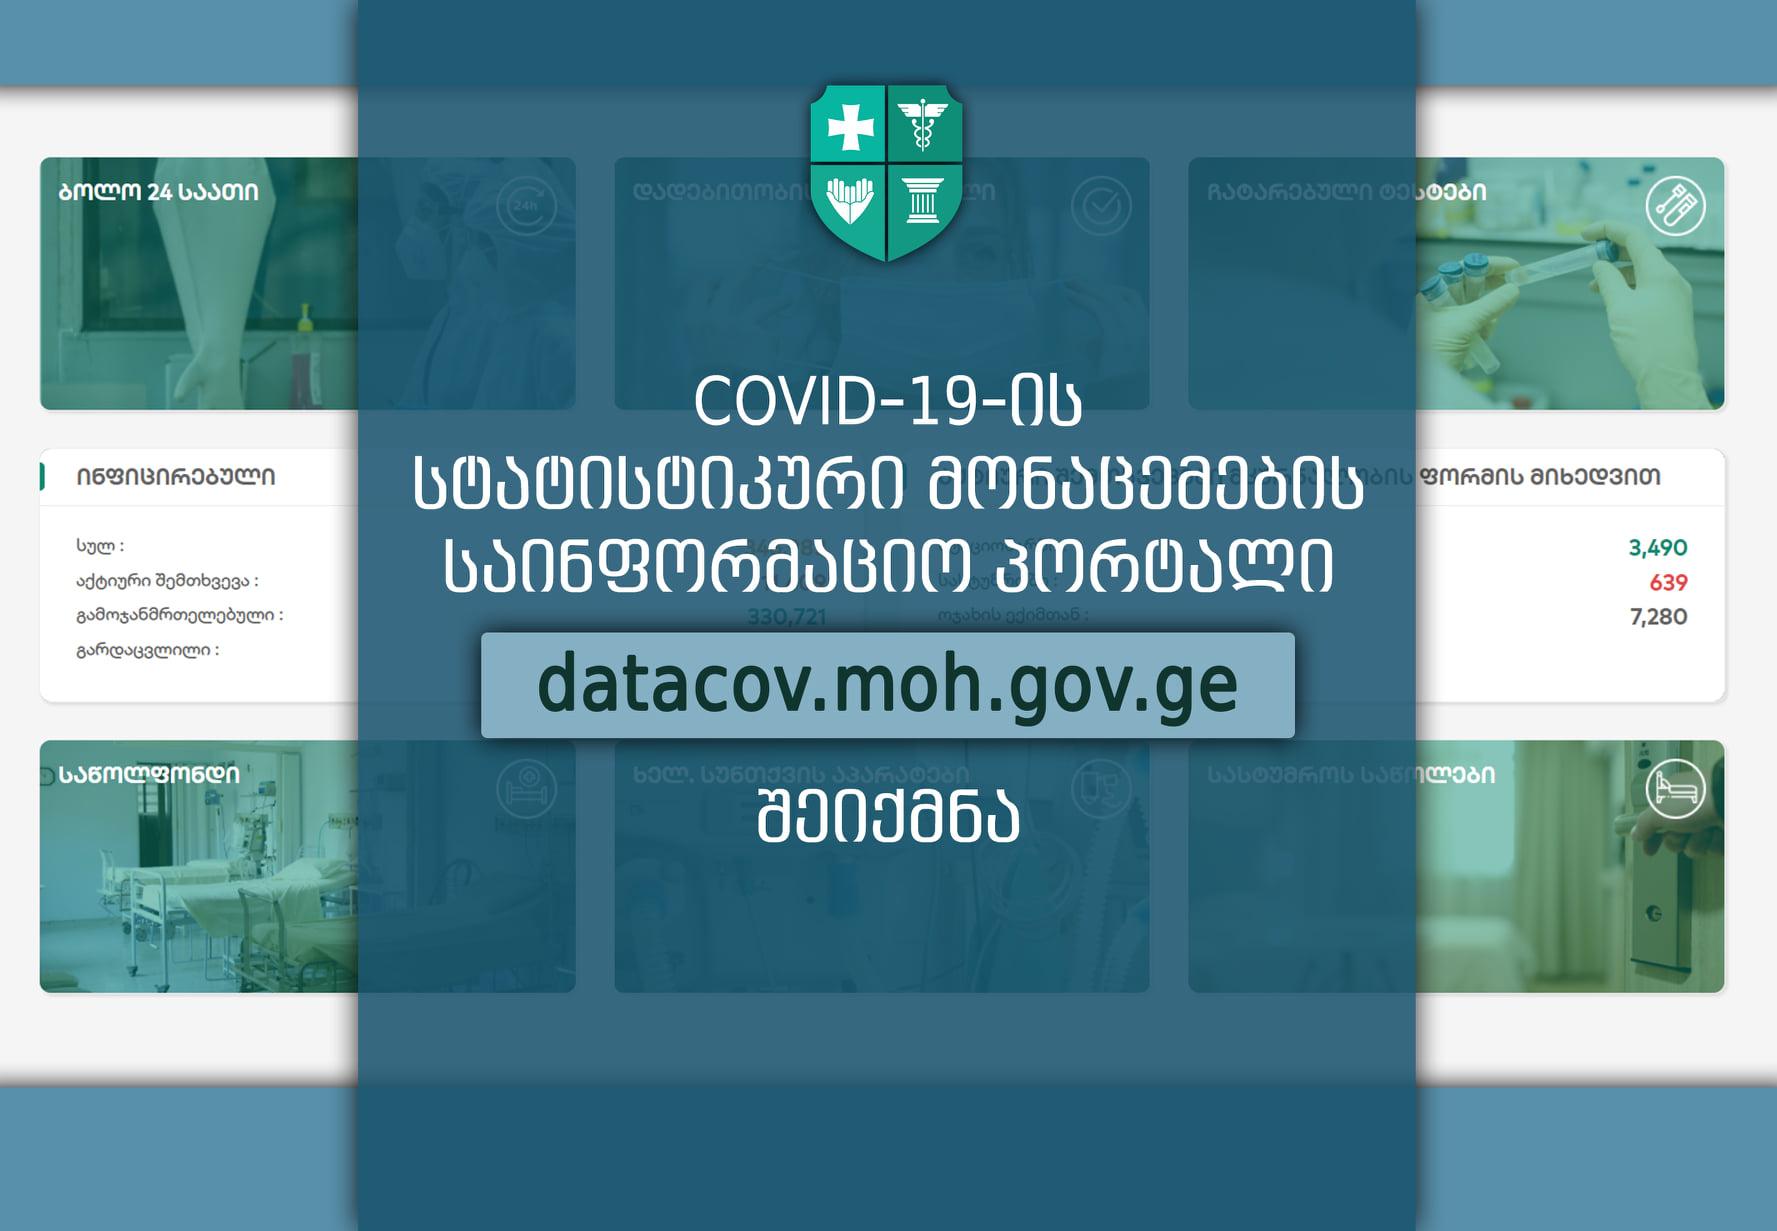 Covid-19-ის სტატისტიკური მონაცემების საინფორმაციო პორტალი